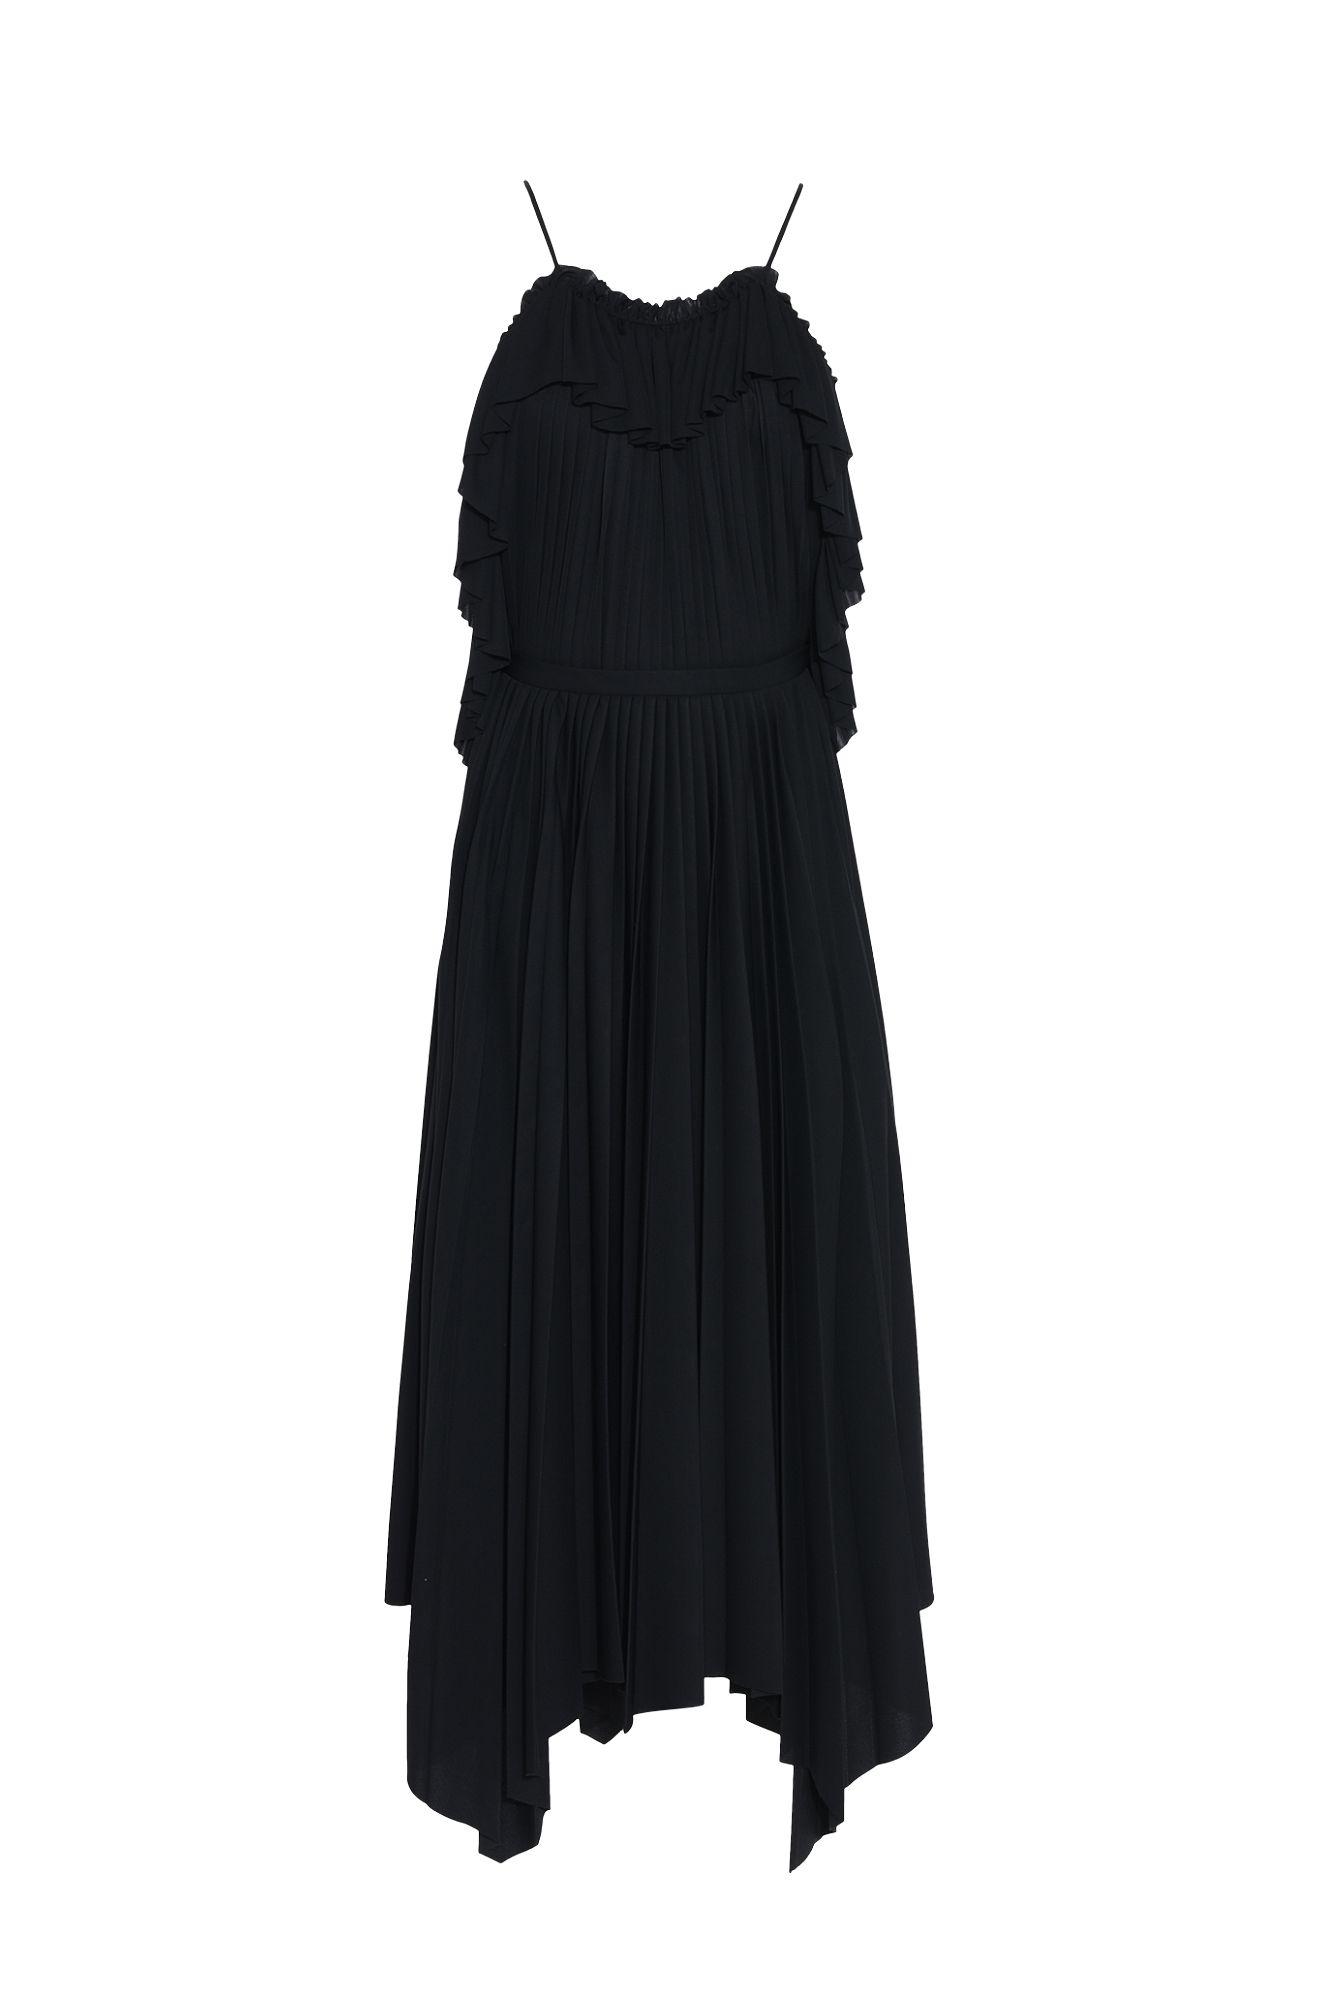 CASTAWAY BLACK DRESS